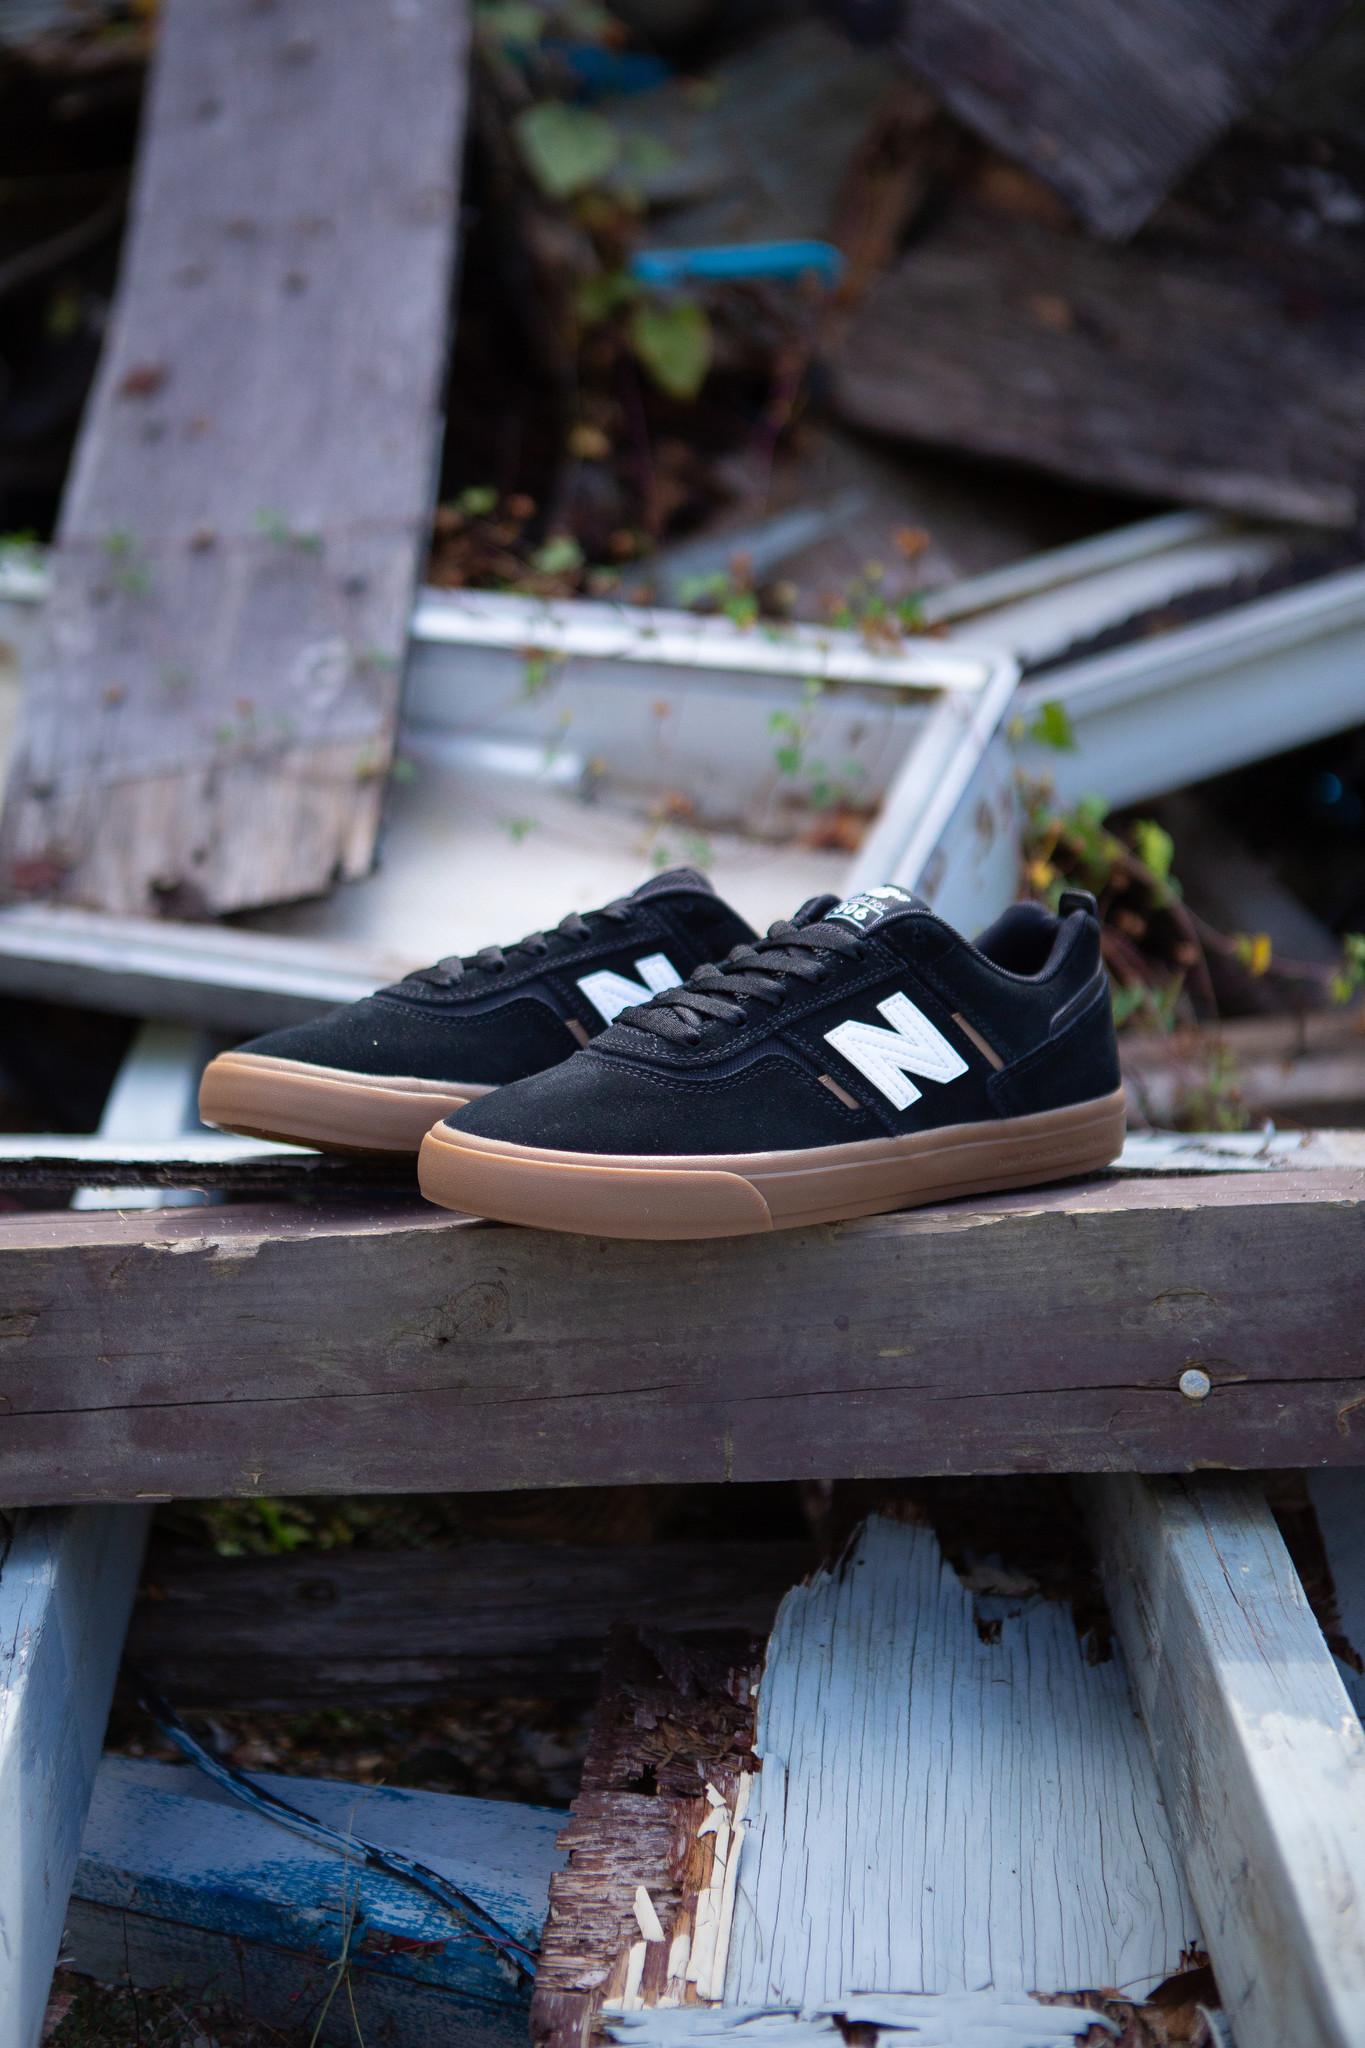 New Balance Jamie Foy 306 black gum